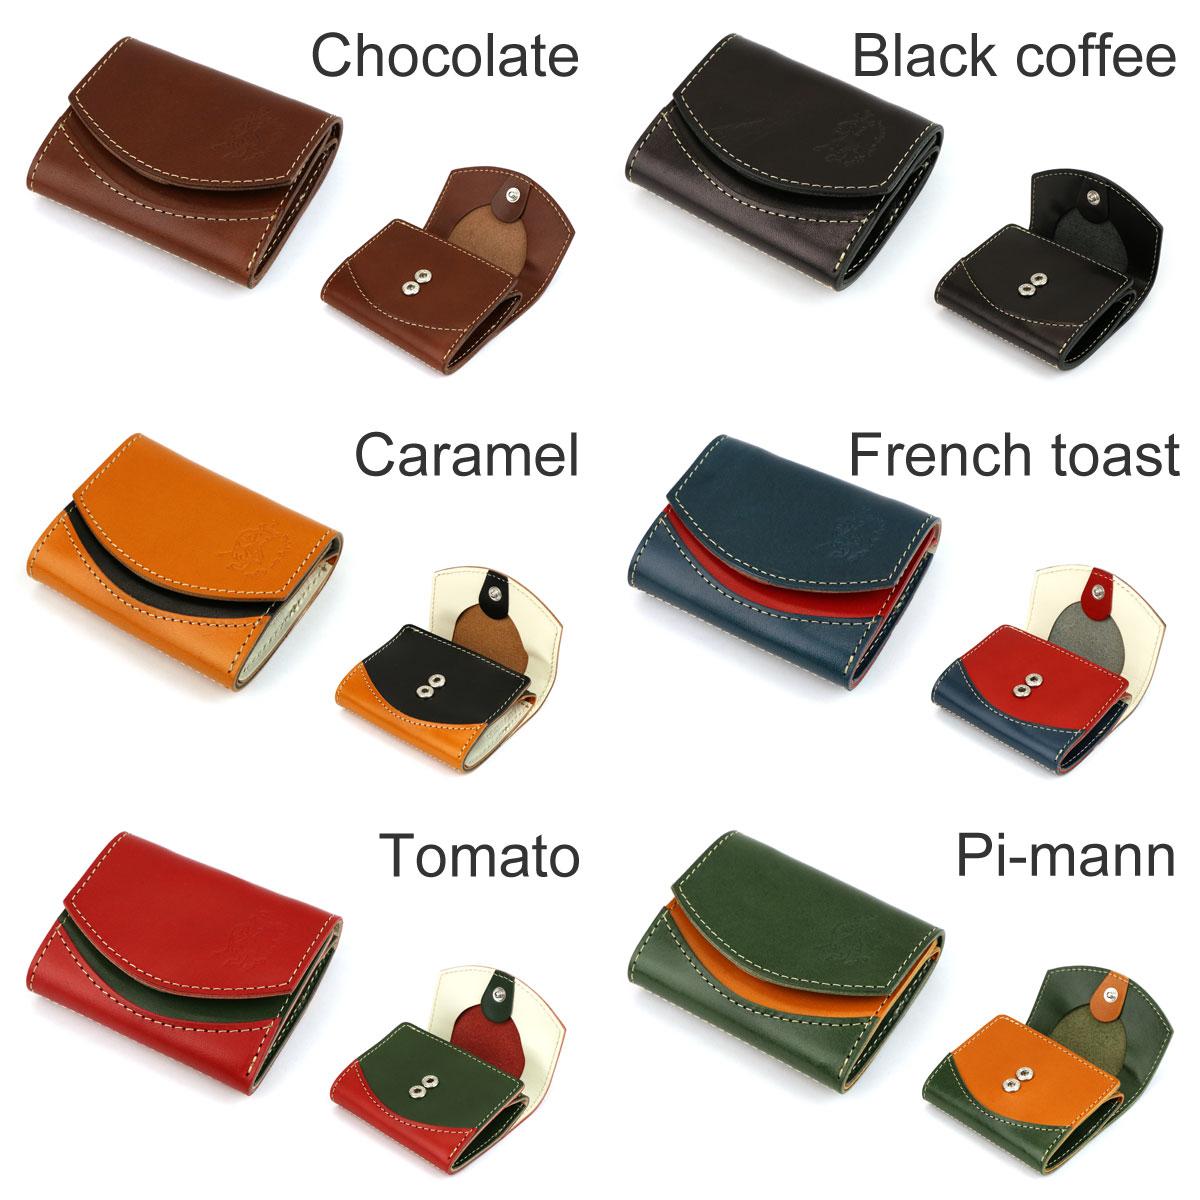 Chocolate, Black coffee, Mint, Caramel, French toast, Tomato, Mango shake, Pi-man